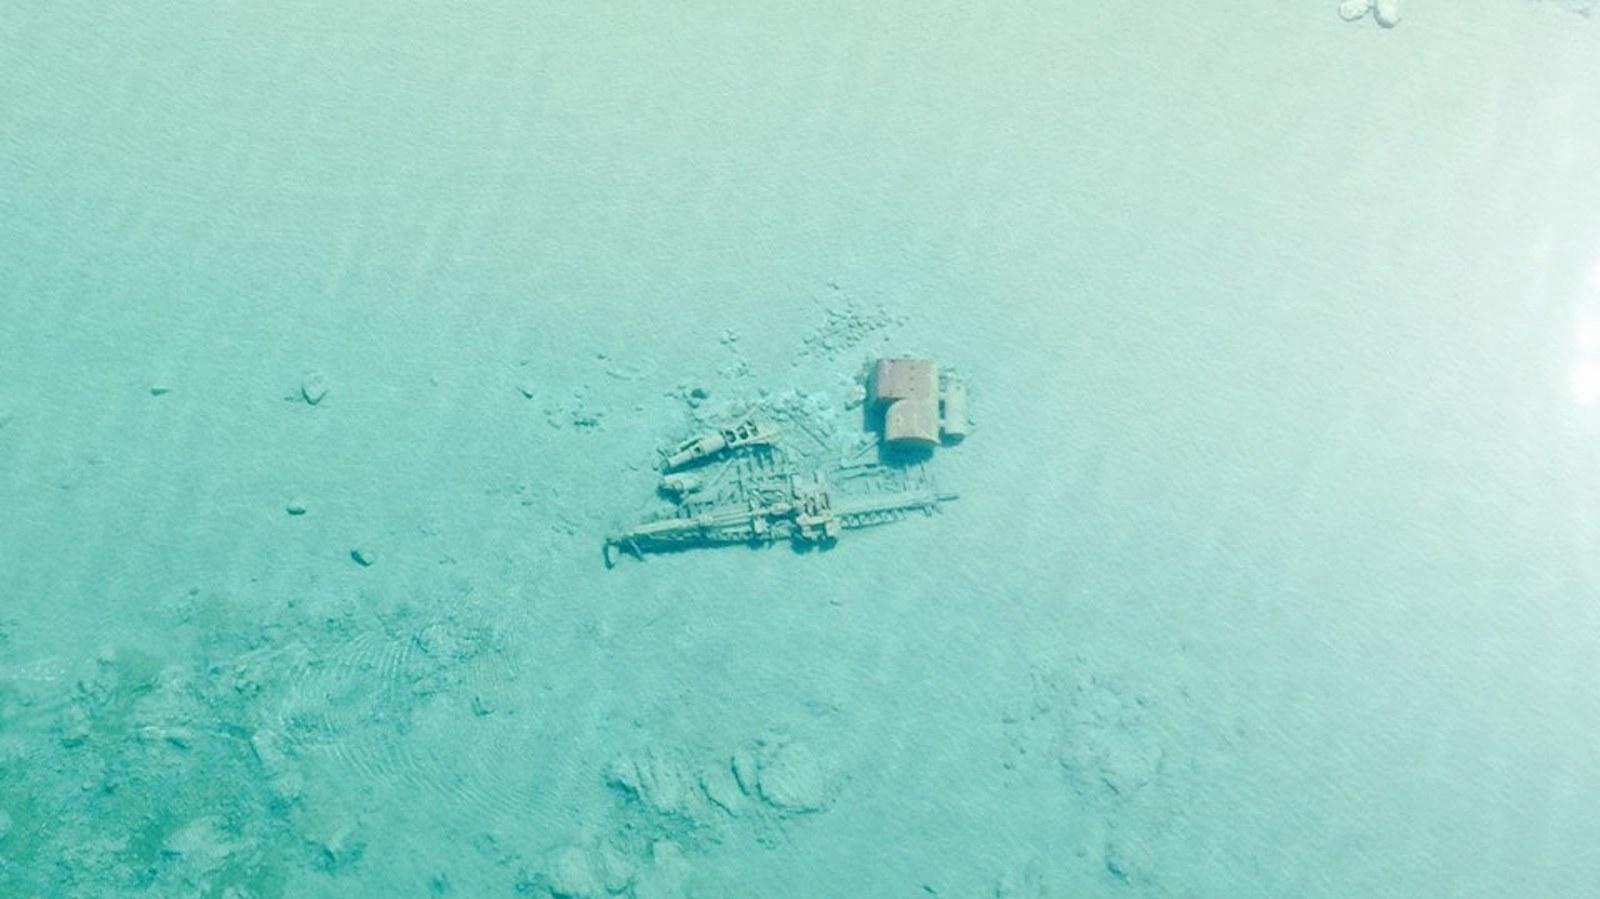 Shipwrecks feature